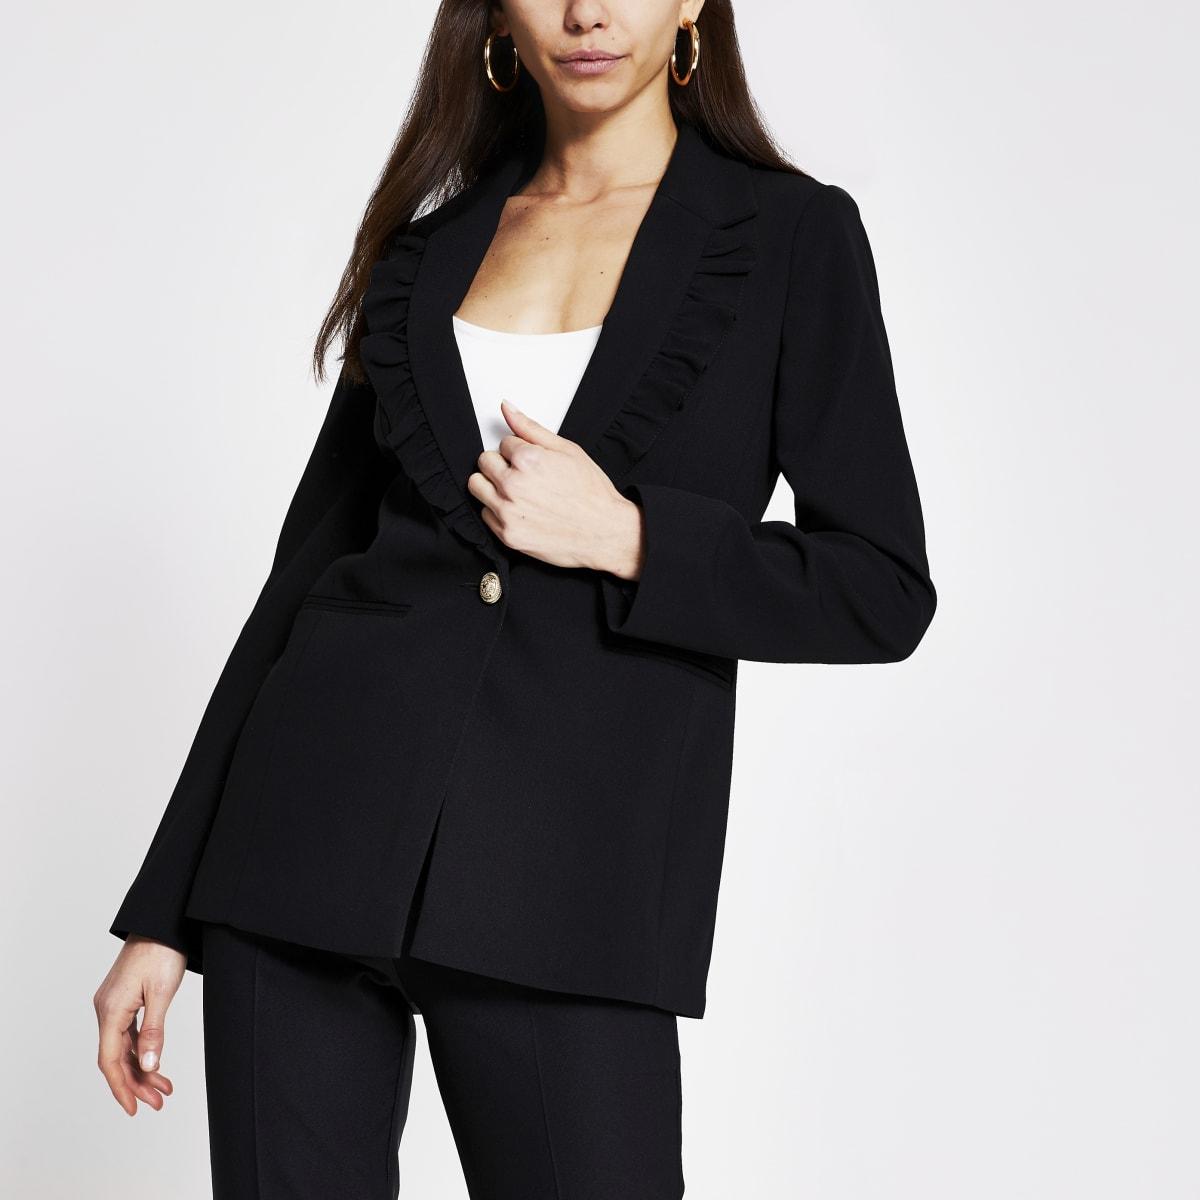 Black frill collar blazer